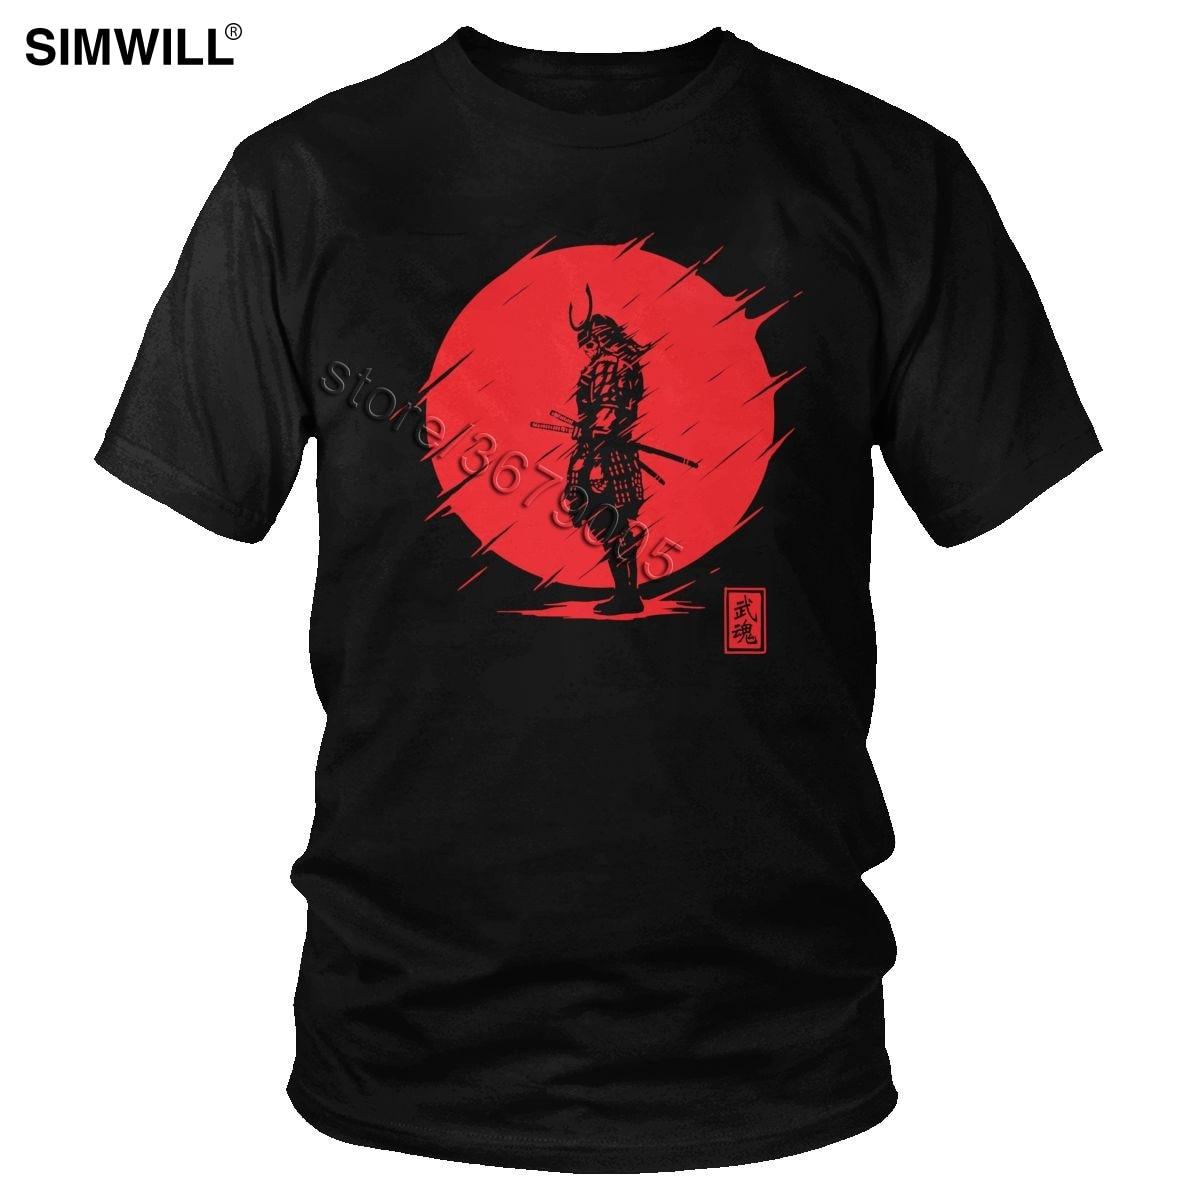 Cool Samurai Spirit T Shirt Men Brand Short Sleeve Cotton Tee Top Red Sun Japanese Armor Warrior T-shirt Oversize Classic Tshirt(China)